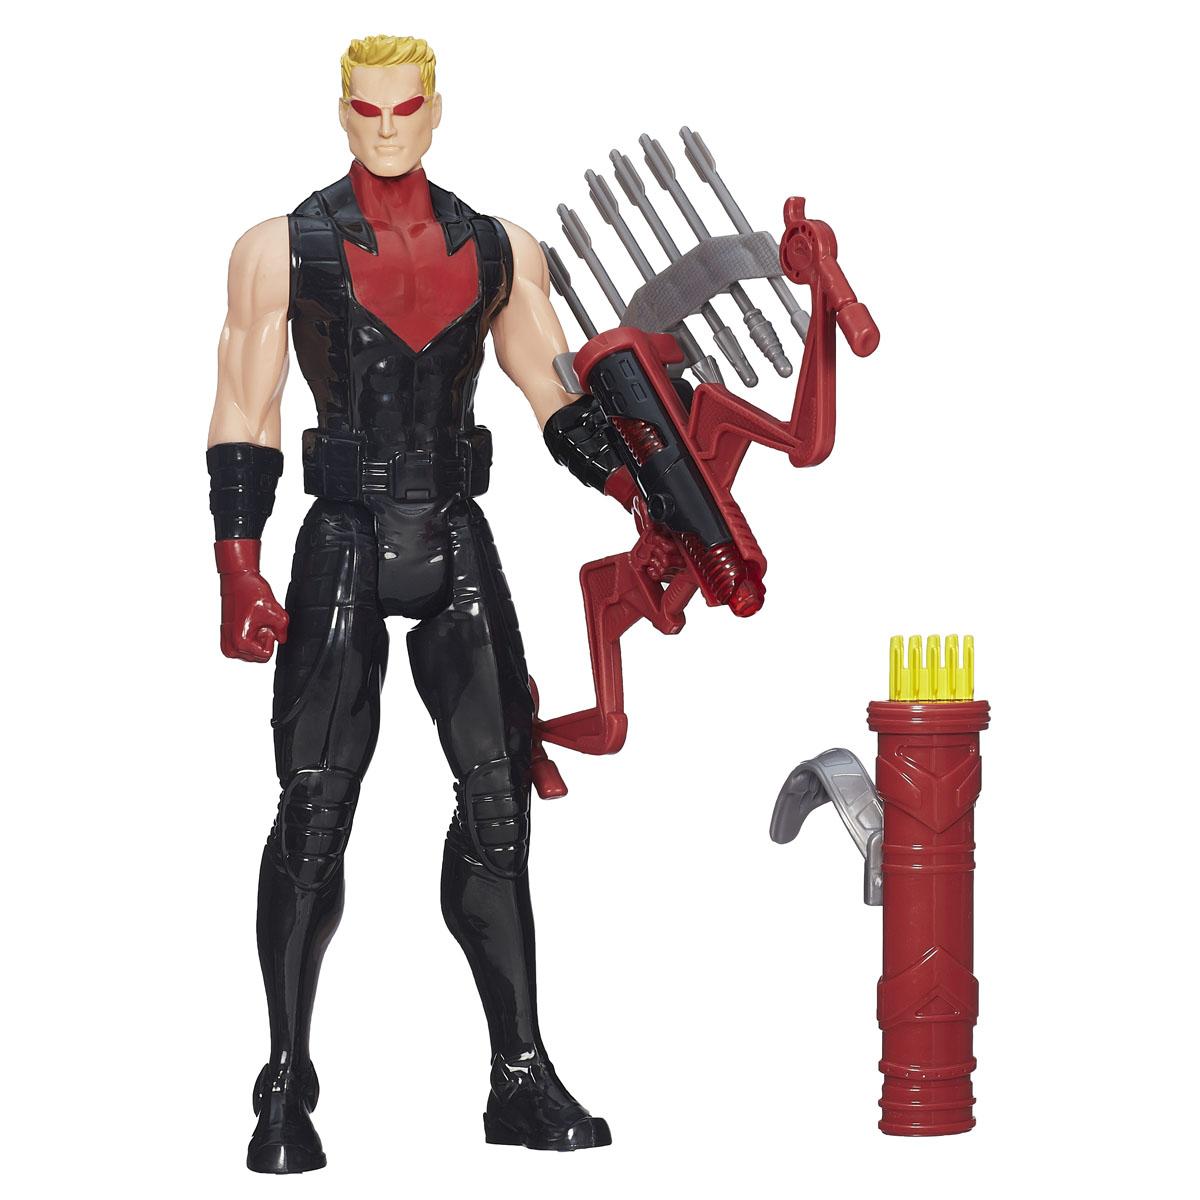 Фигурка Avengers Титаны: Marvel's Hawkeye, с аксессуарами, 29 см